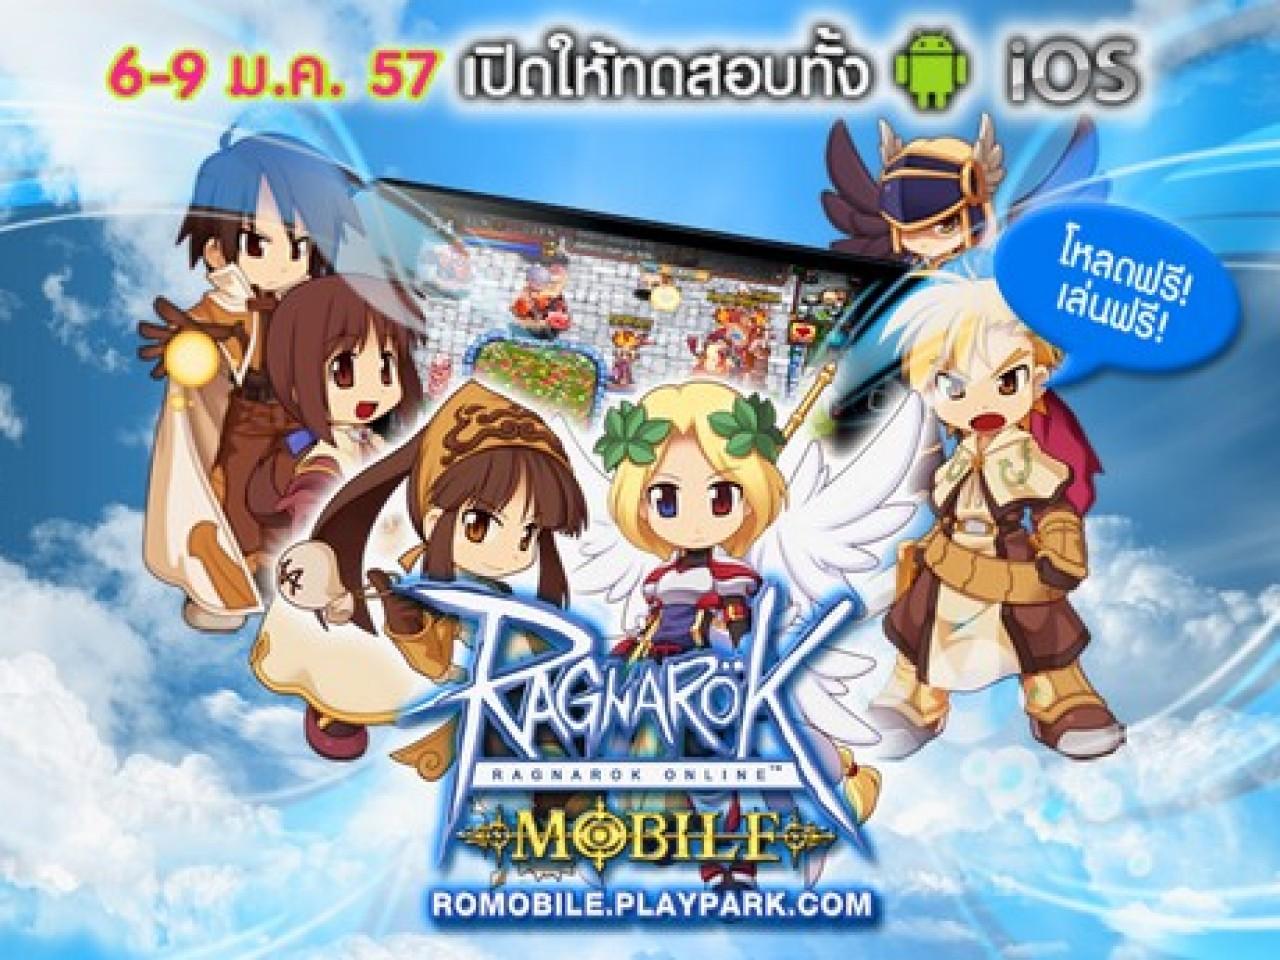 Ragnarok Mobile เปิดทดสอบ CBT รอบ 2 สุดคึกคักคนแน่นเซิร์ฟ